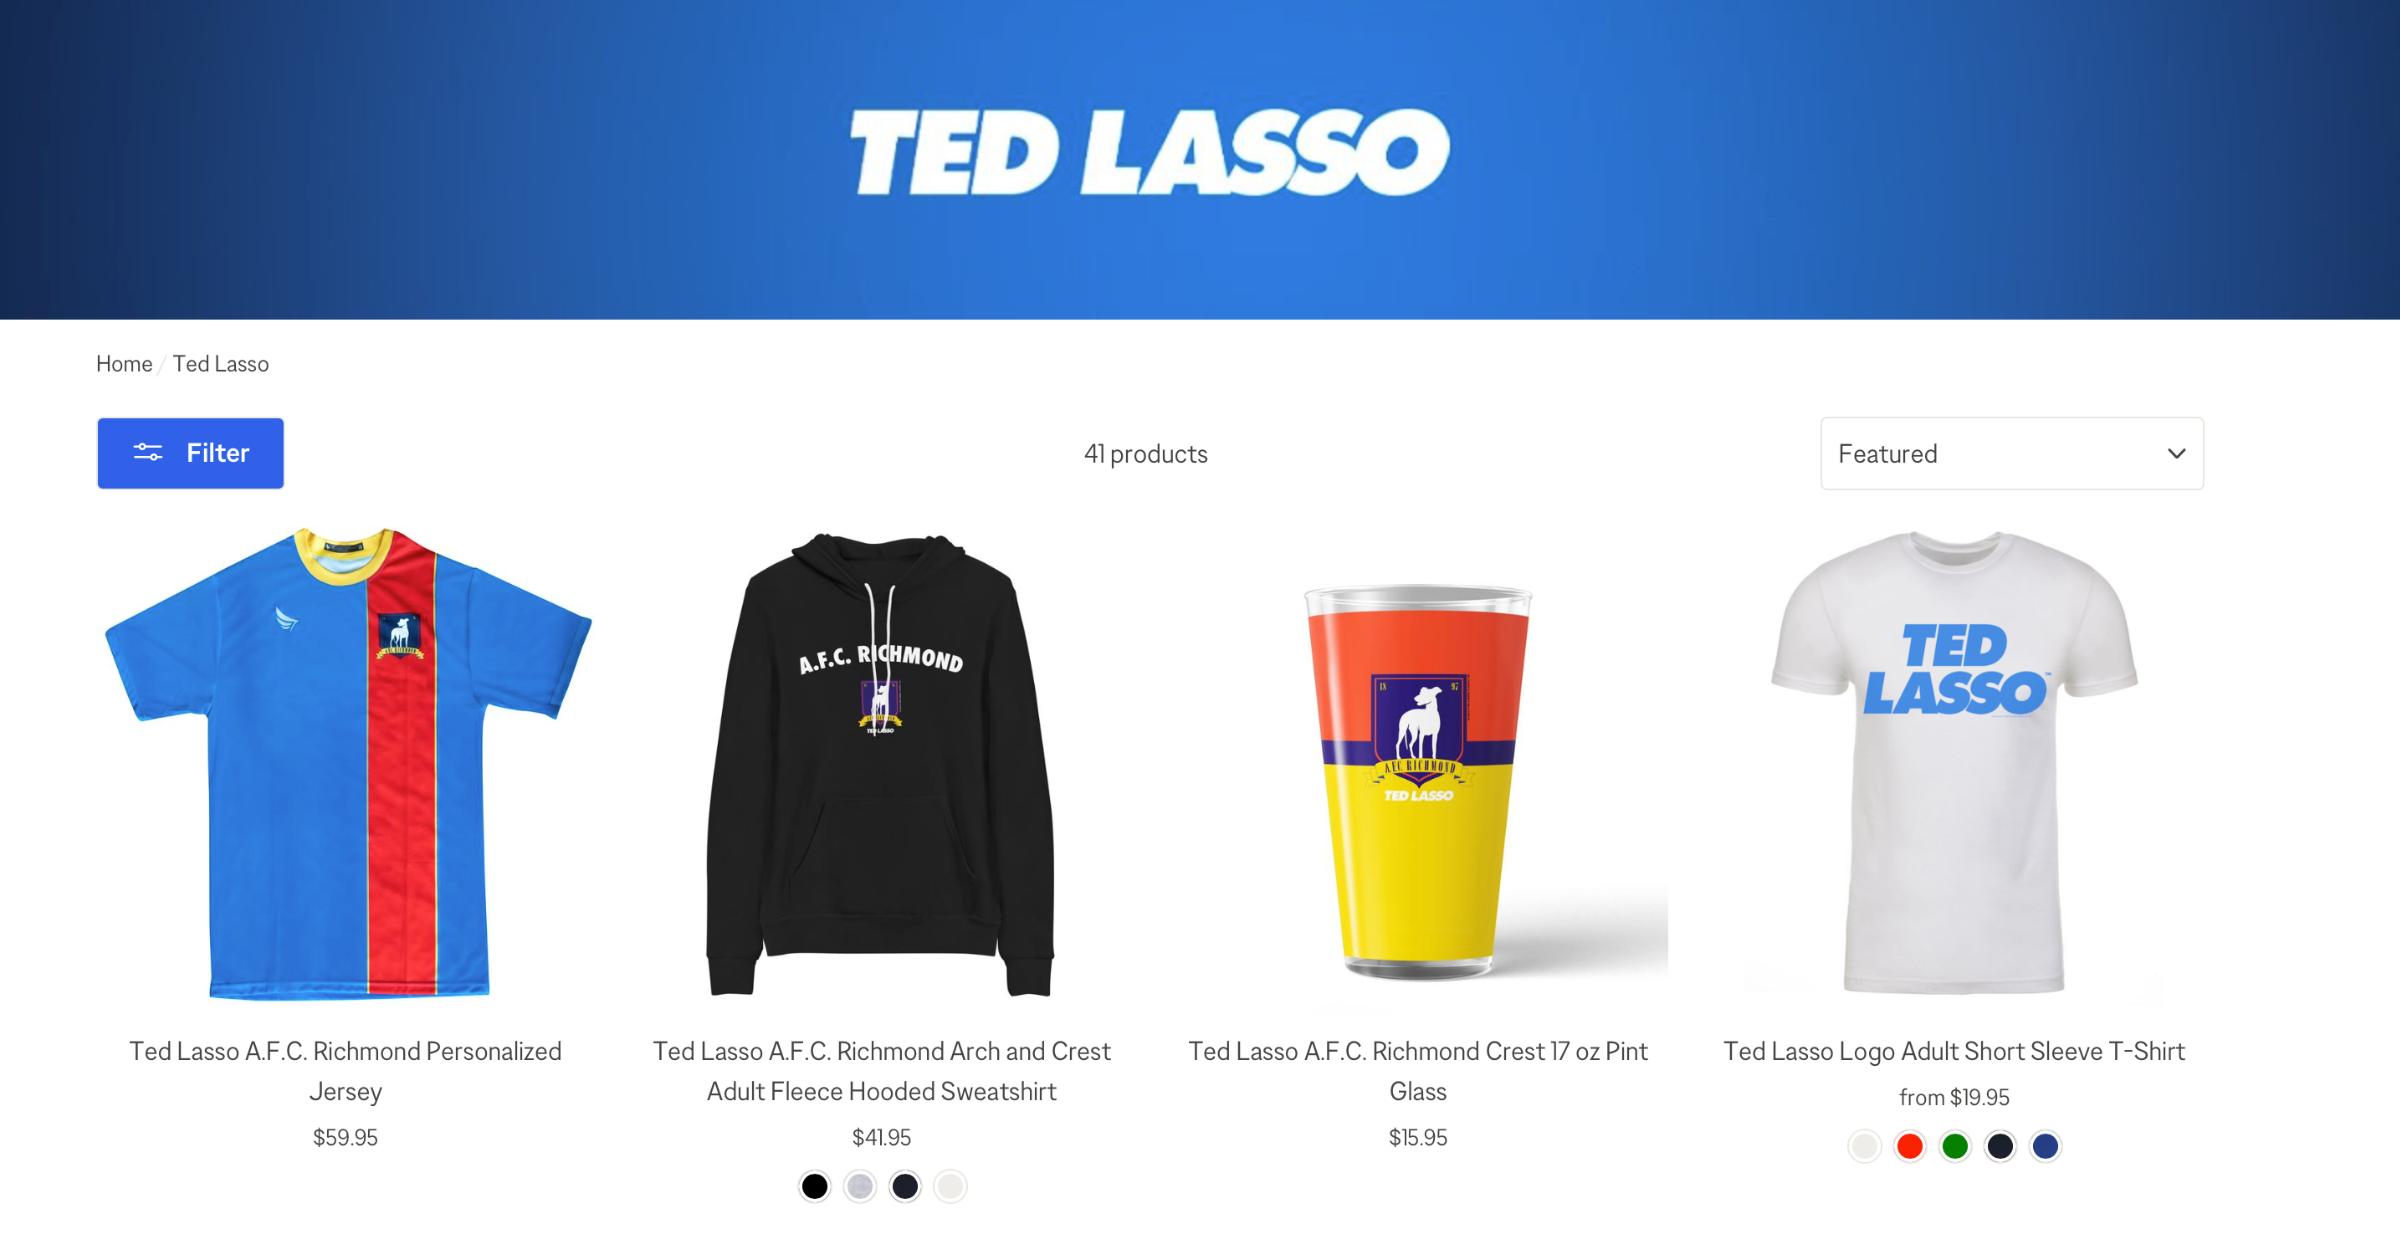 Ted Lasso Merch